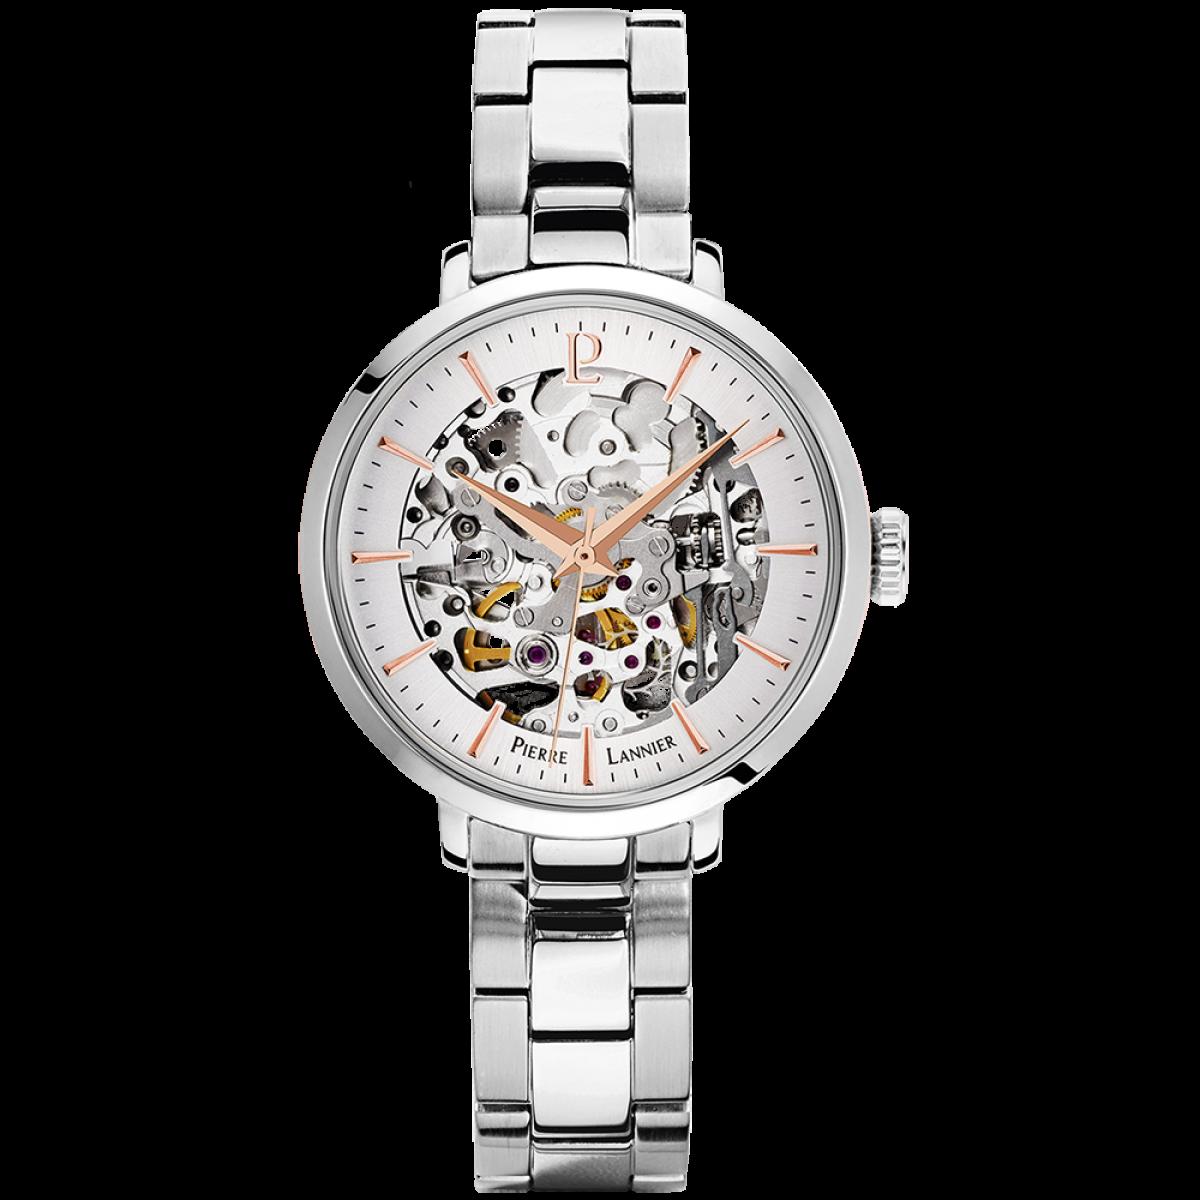 Женские часы PIERRE LANNIER AUTOMATIC 303F621